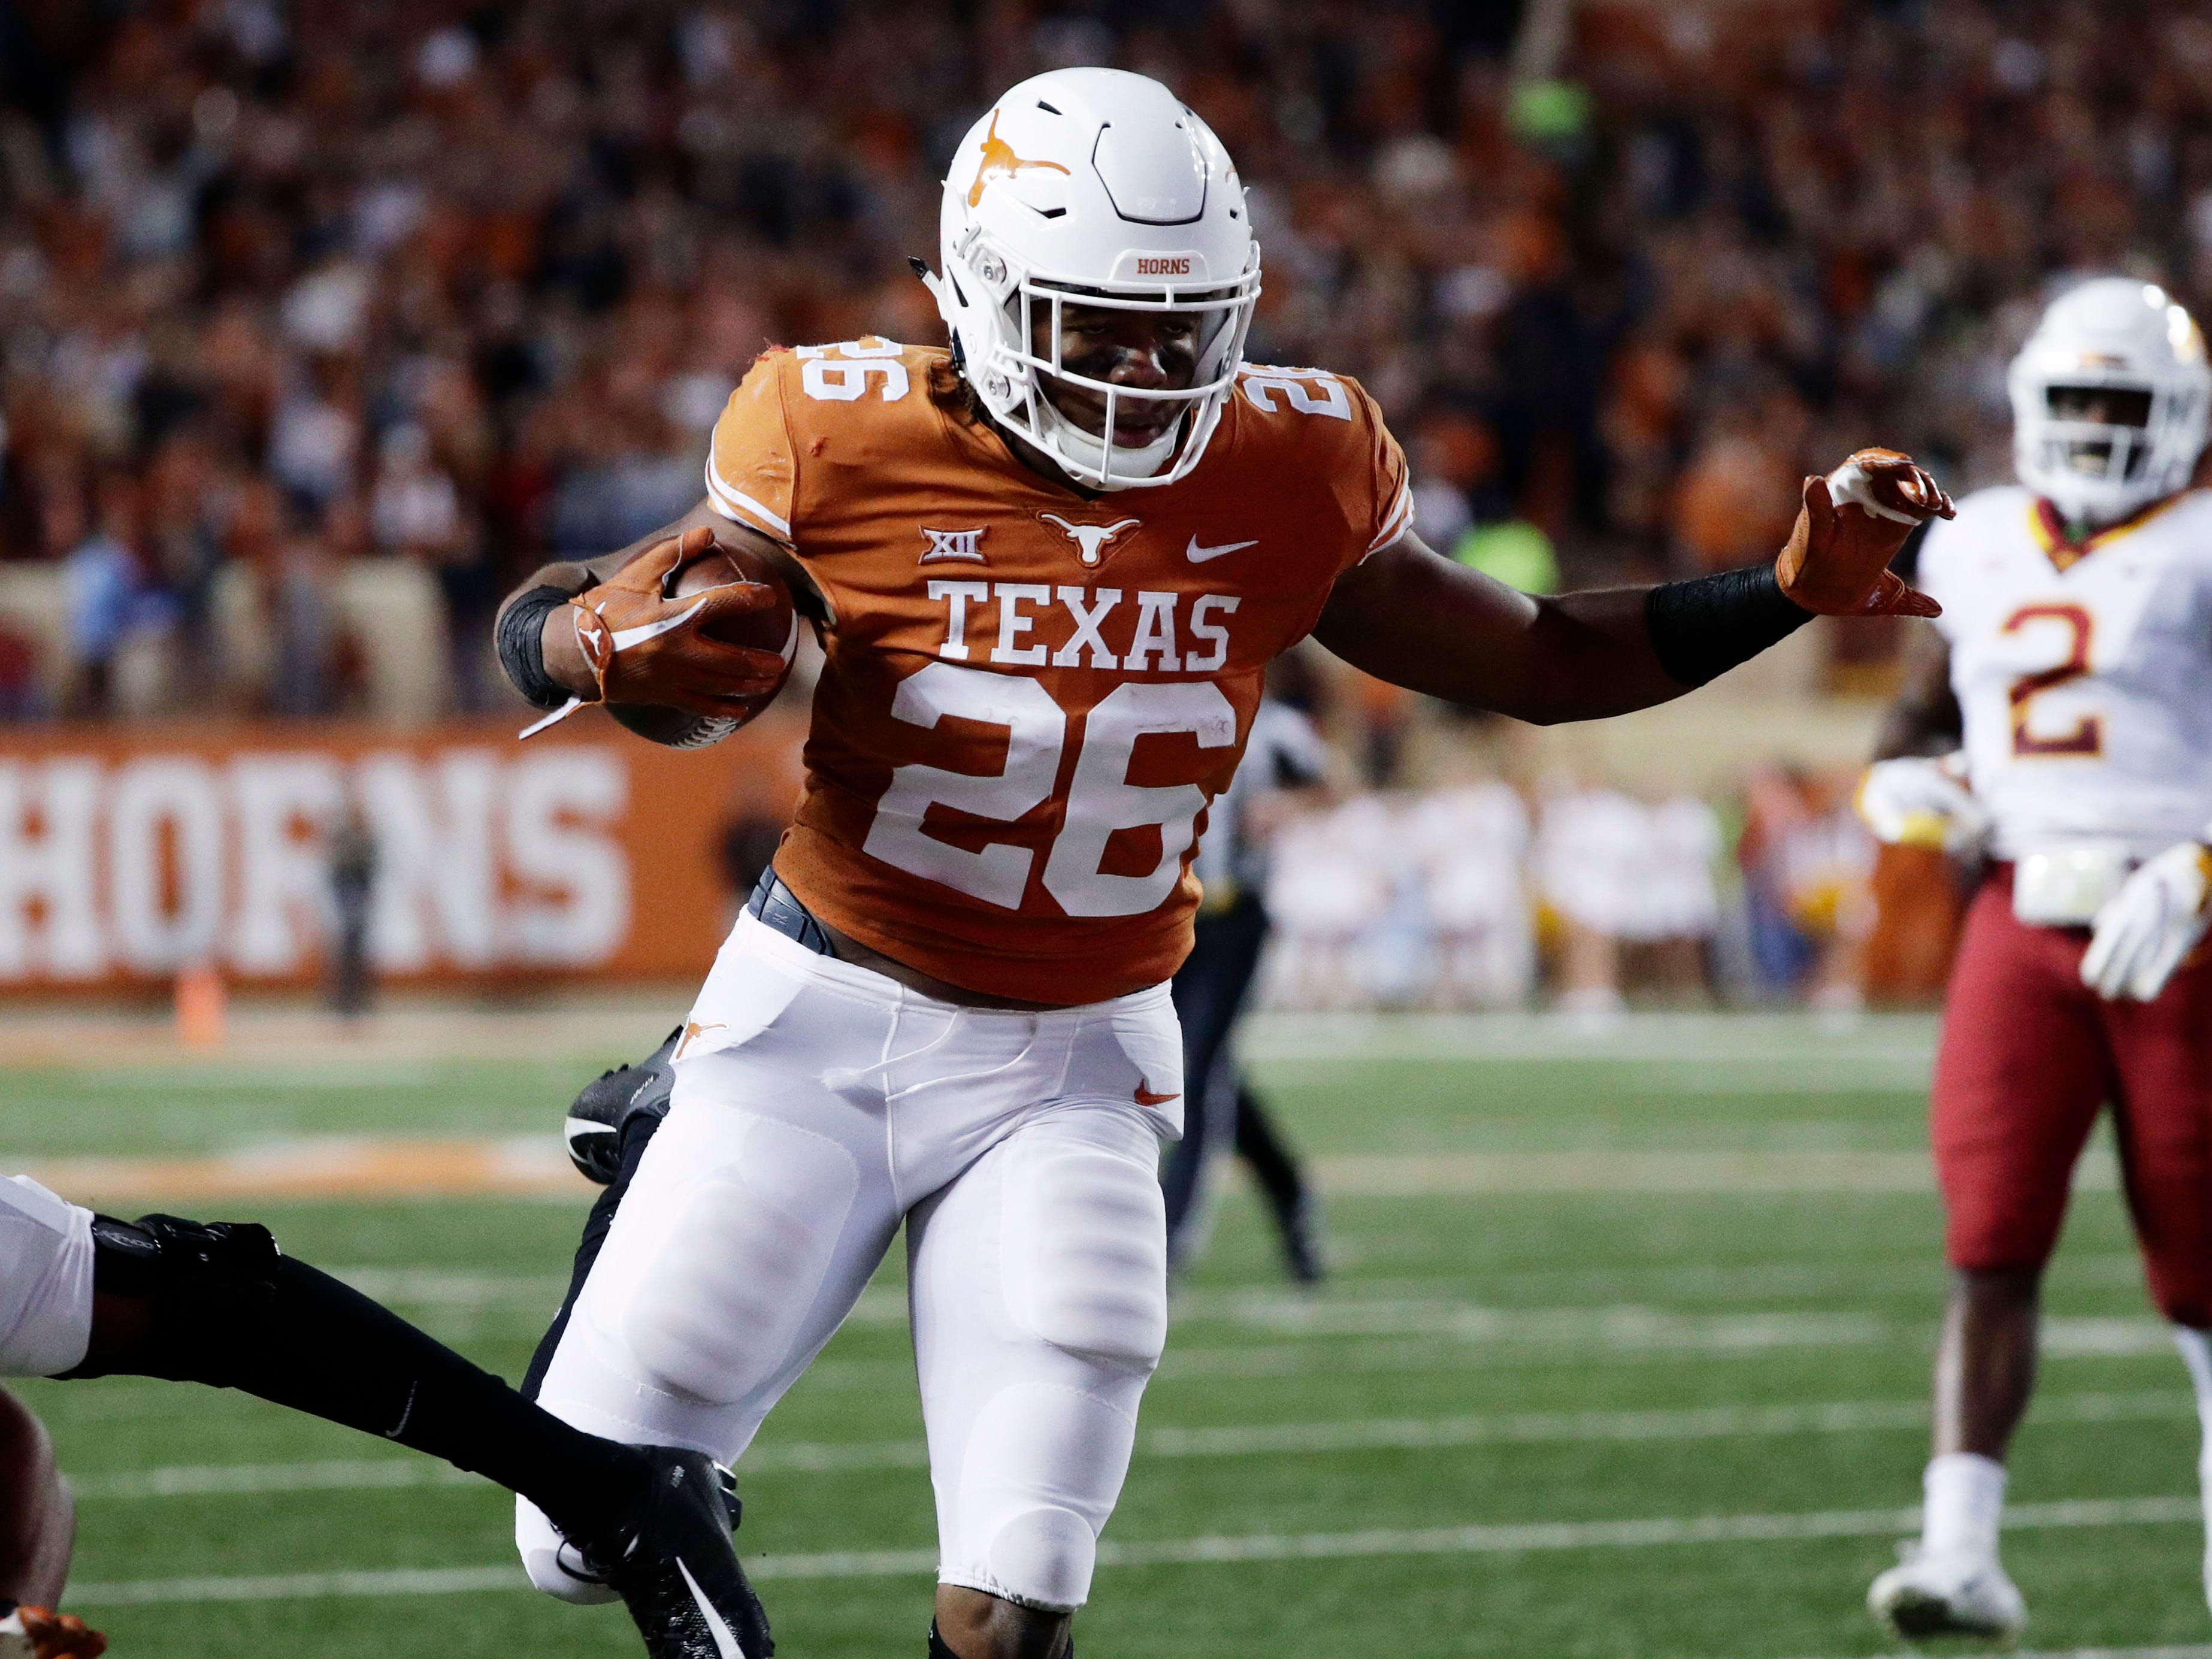 13. Texas (8-3) | Last game: Defeated Iowa State, 24-10 | Previous ranking: 18